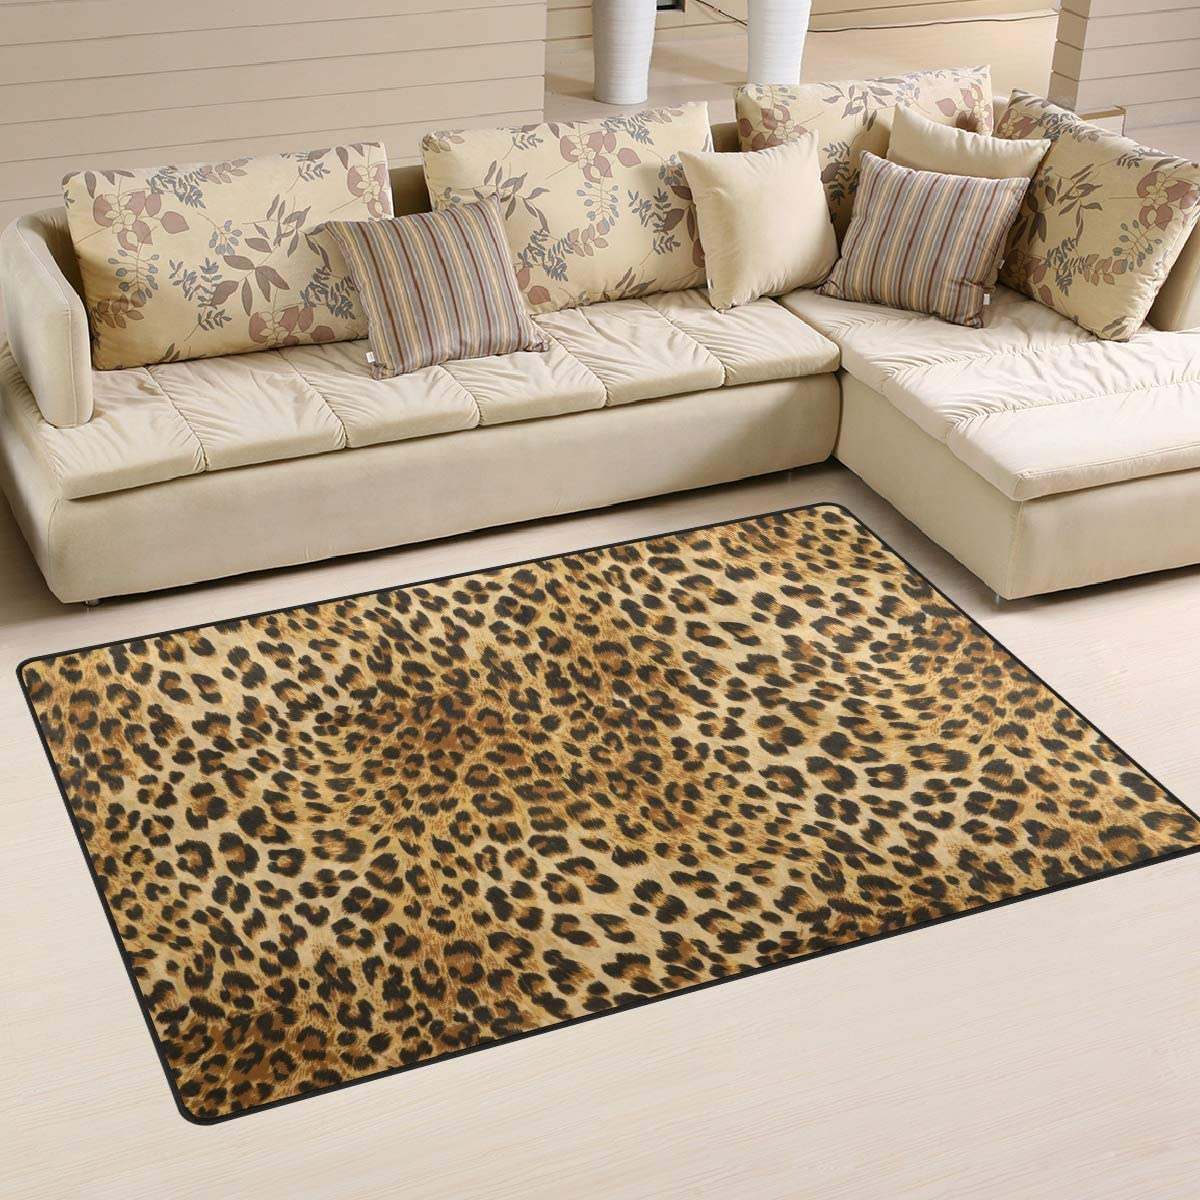 ALAZA Non-Slip Area Rugs Home Decor, Leopard Animal Print Floor Mat Living Room Bedroom Carpets Doormats 31 x 20 inches